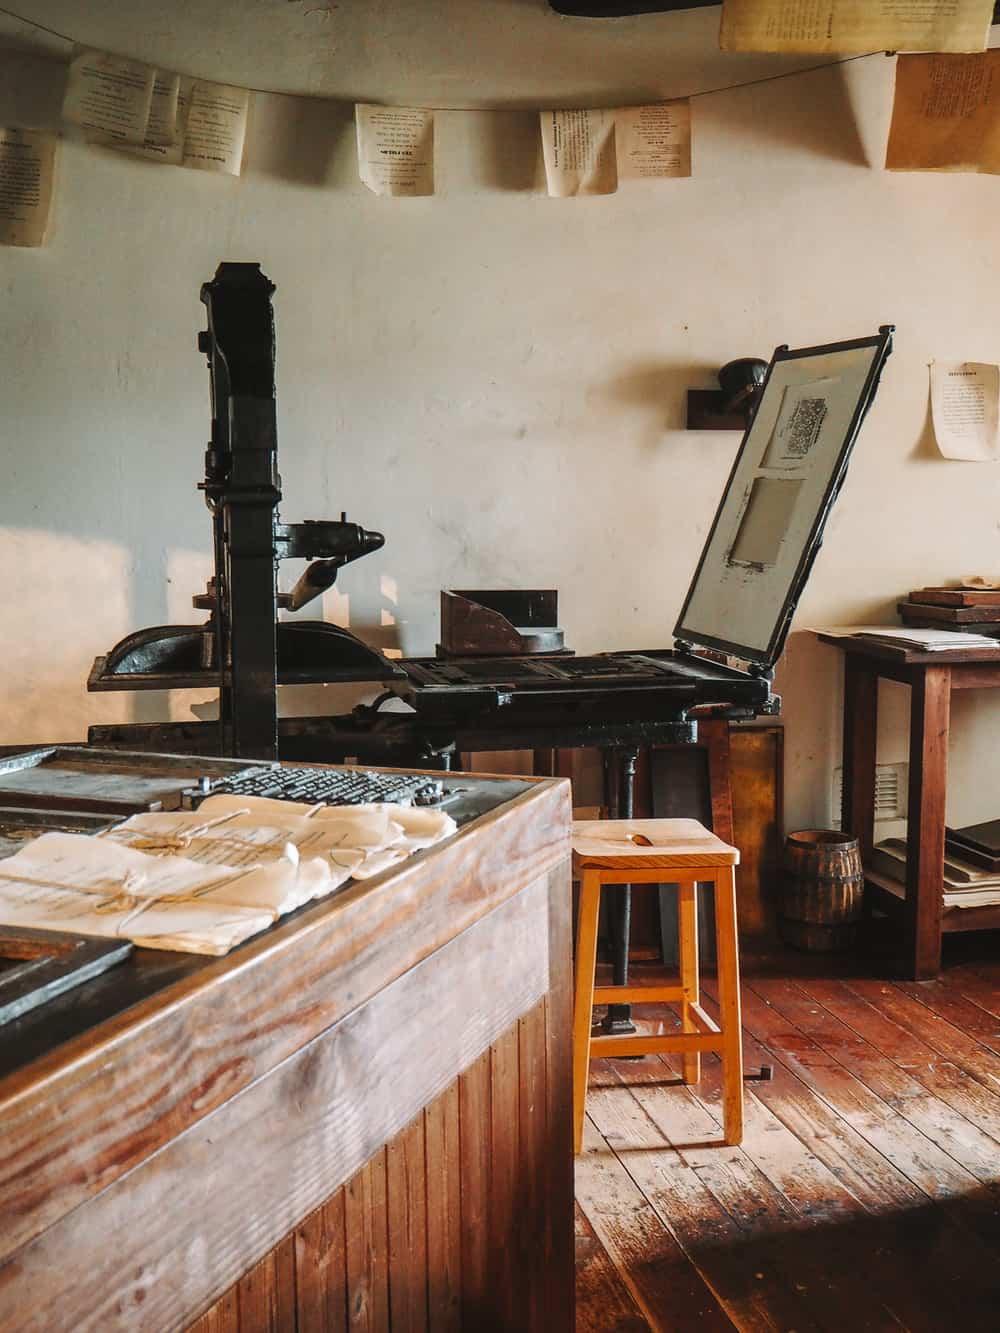 Callendar House 18th century printing press